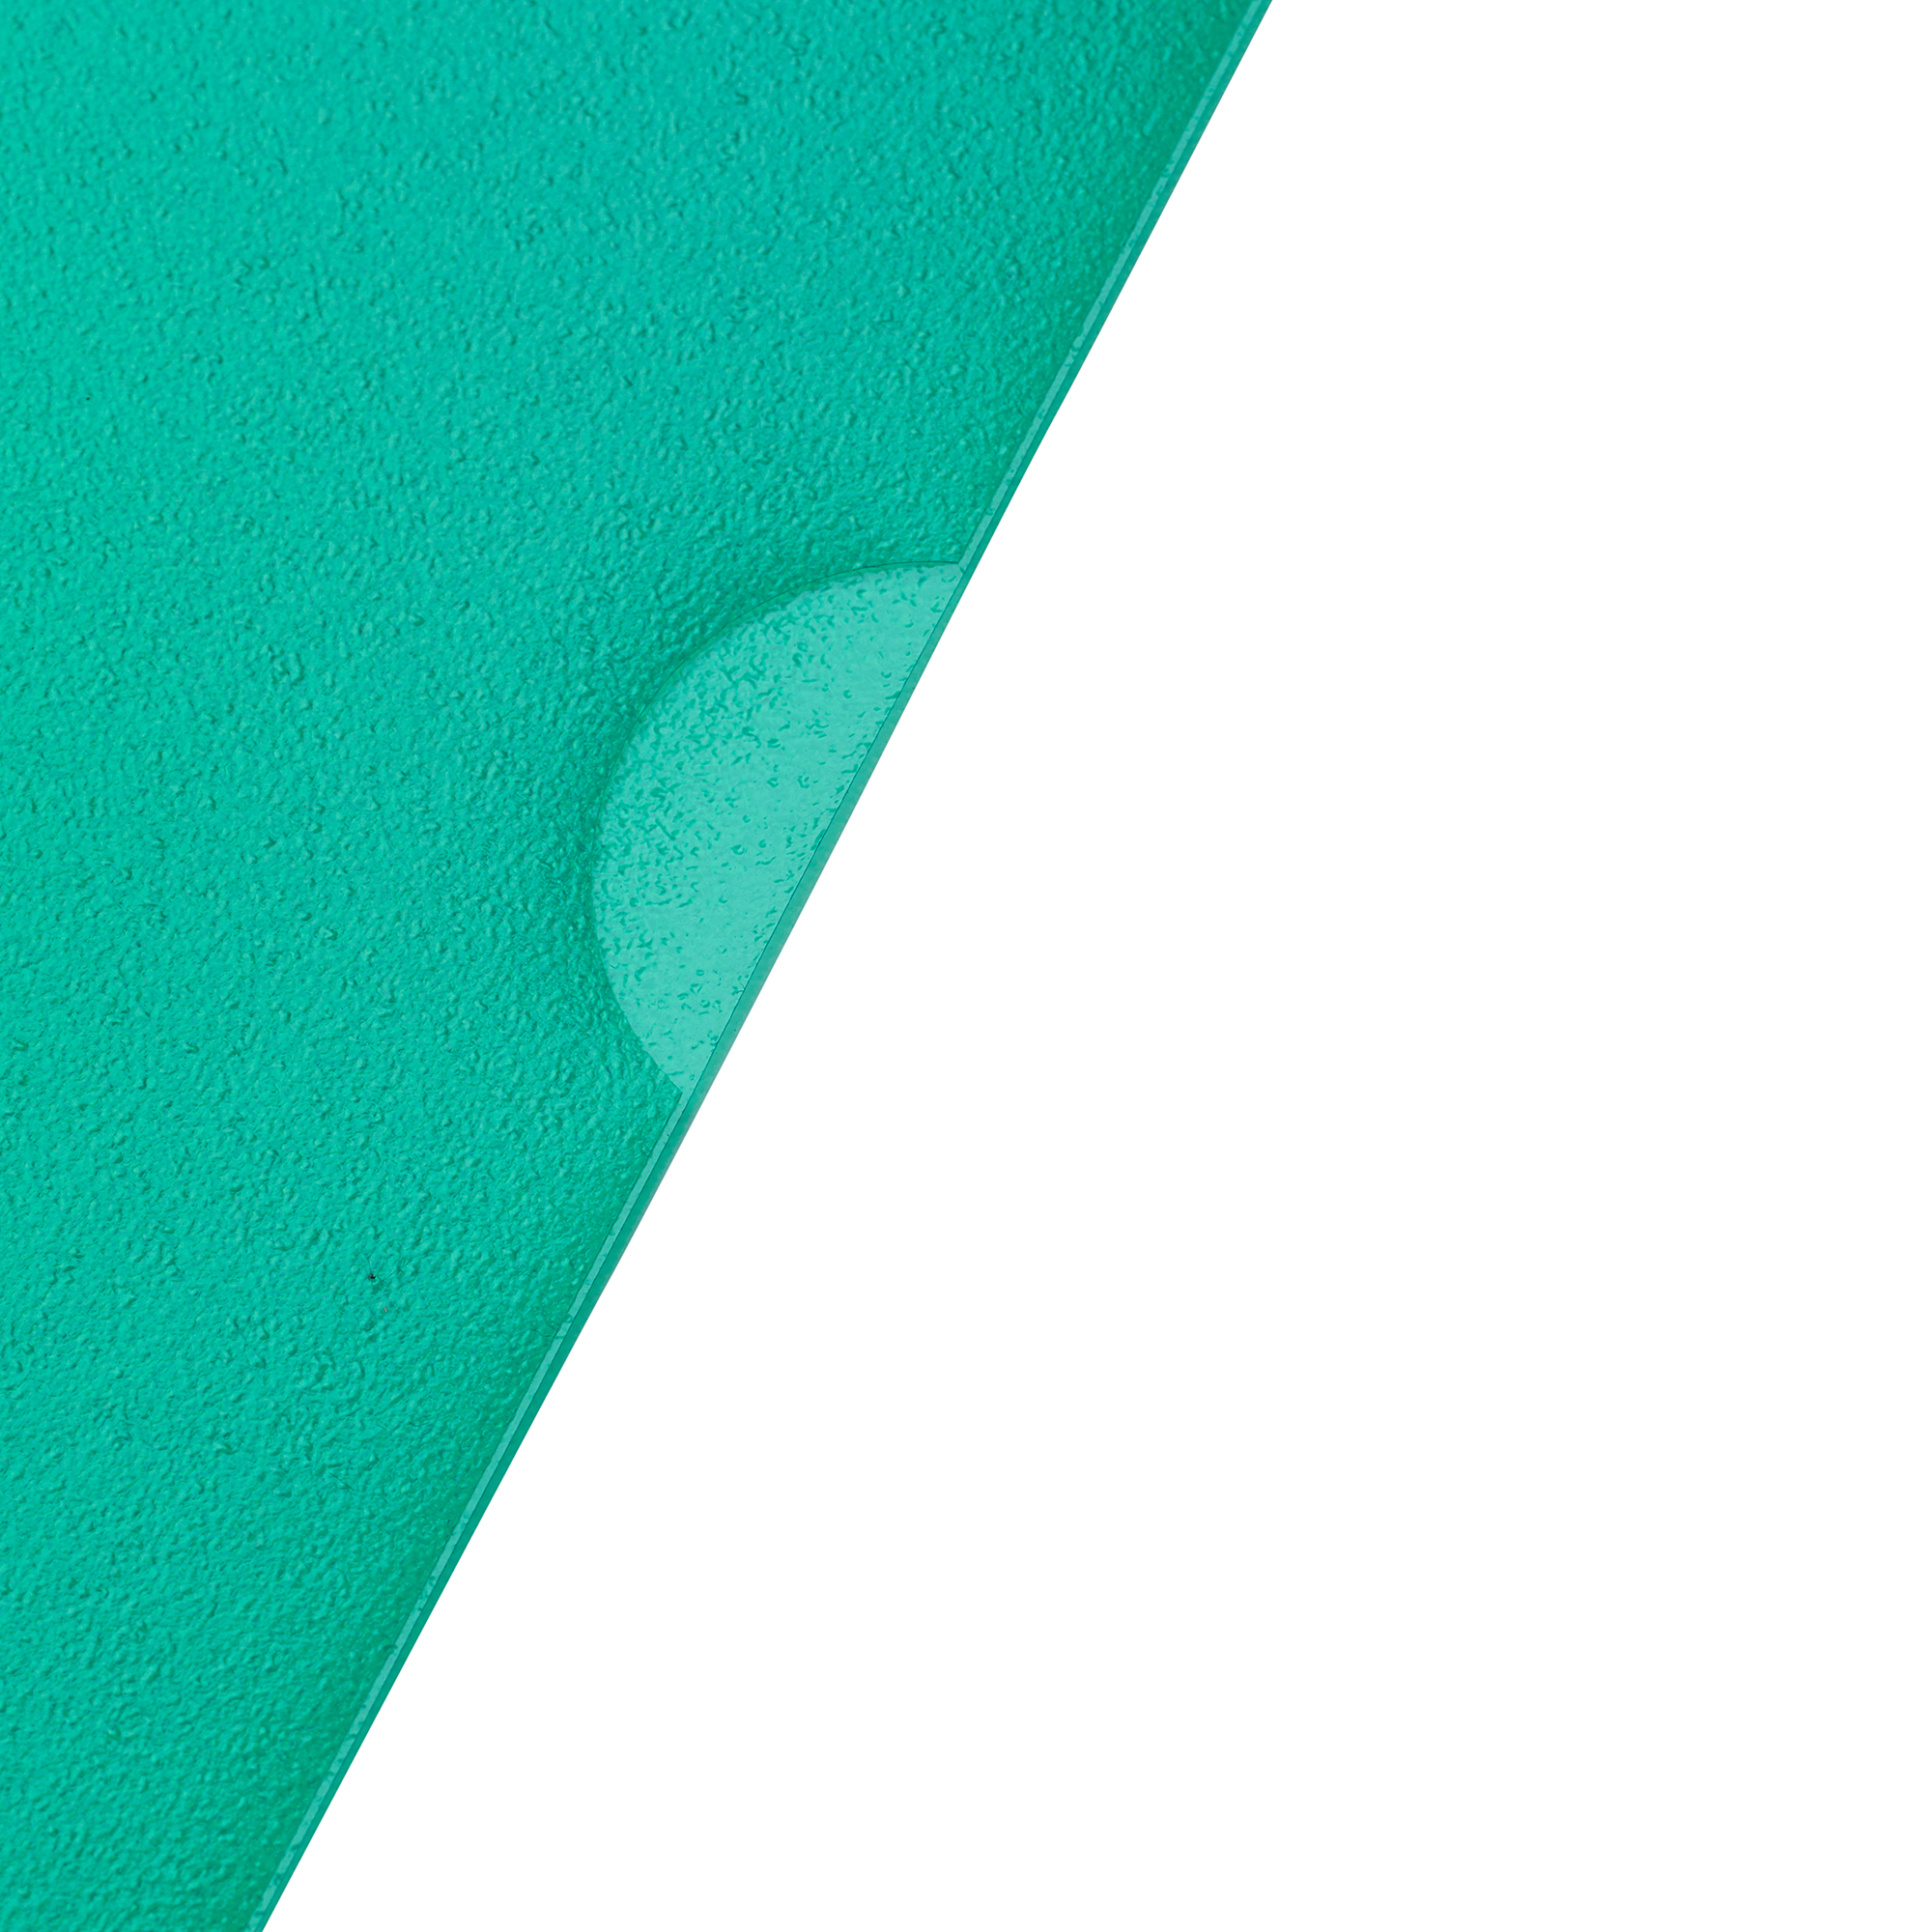 5 Star Office Folder Embossed Cut Flush Polypropylene Copy-safe Translucent 110 Micron A4 Green Pack 25